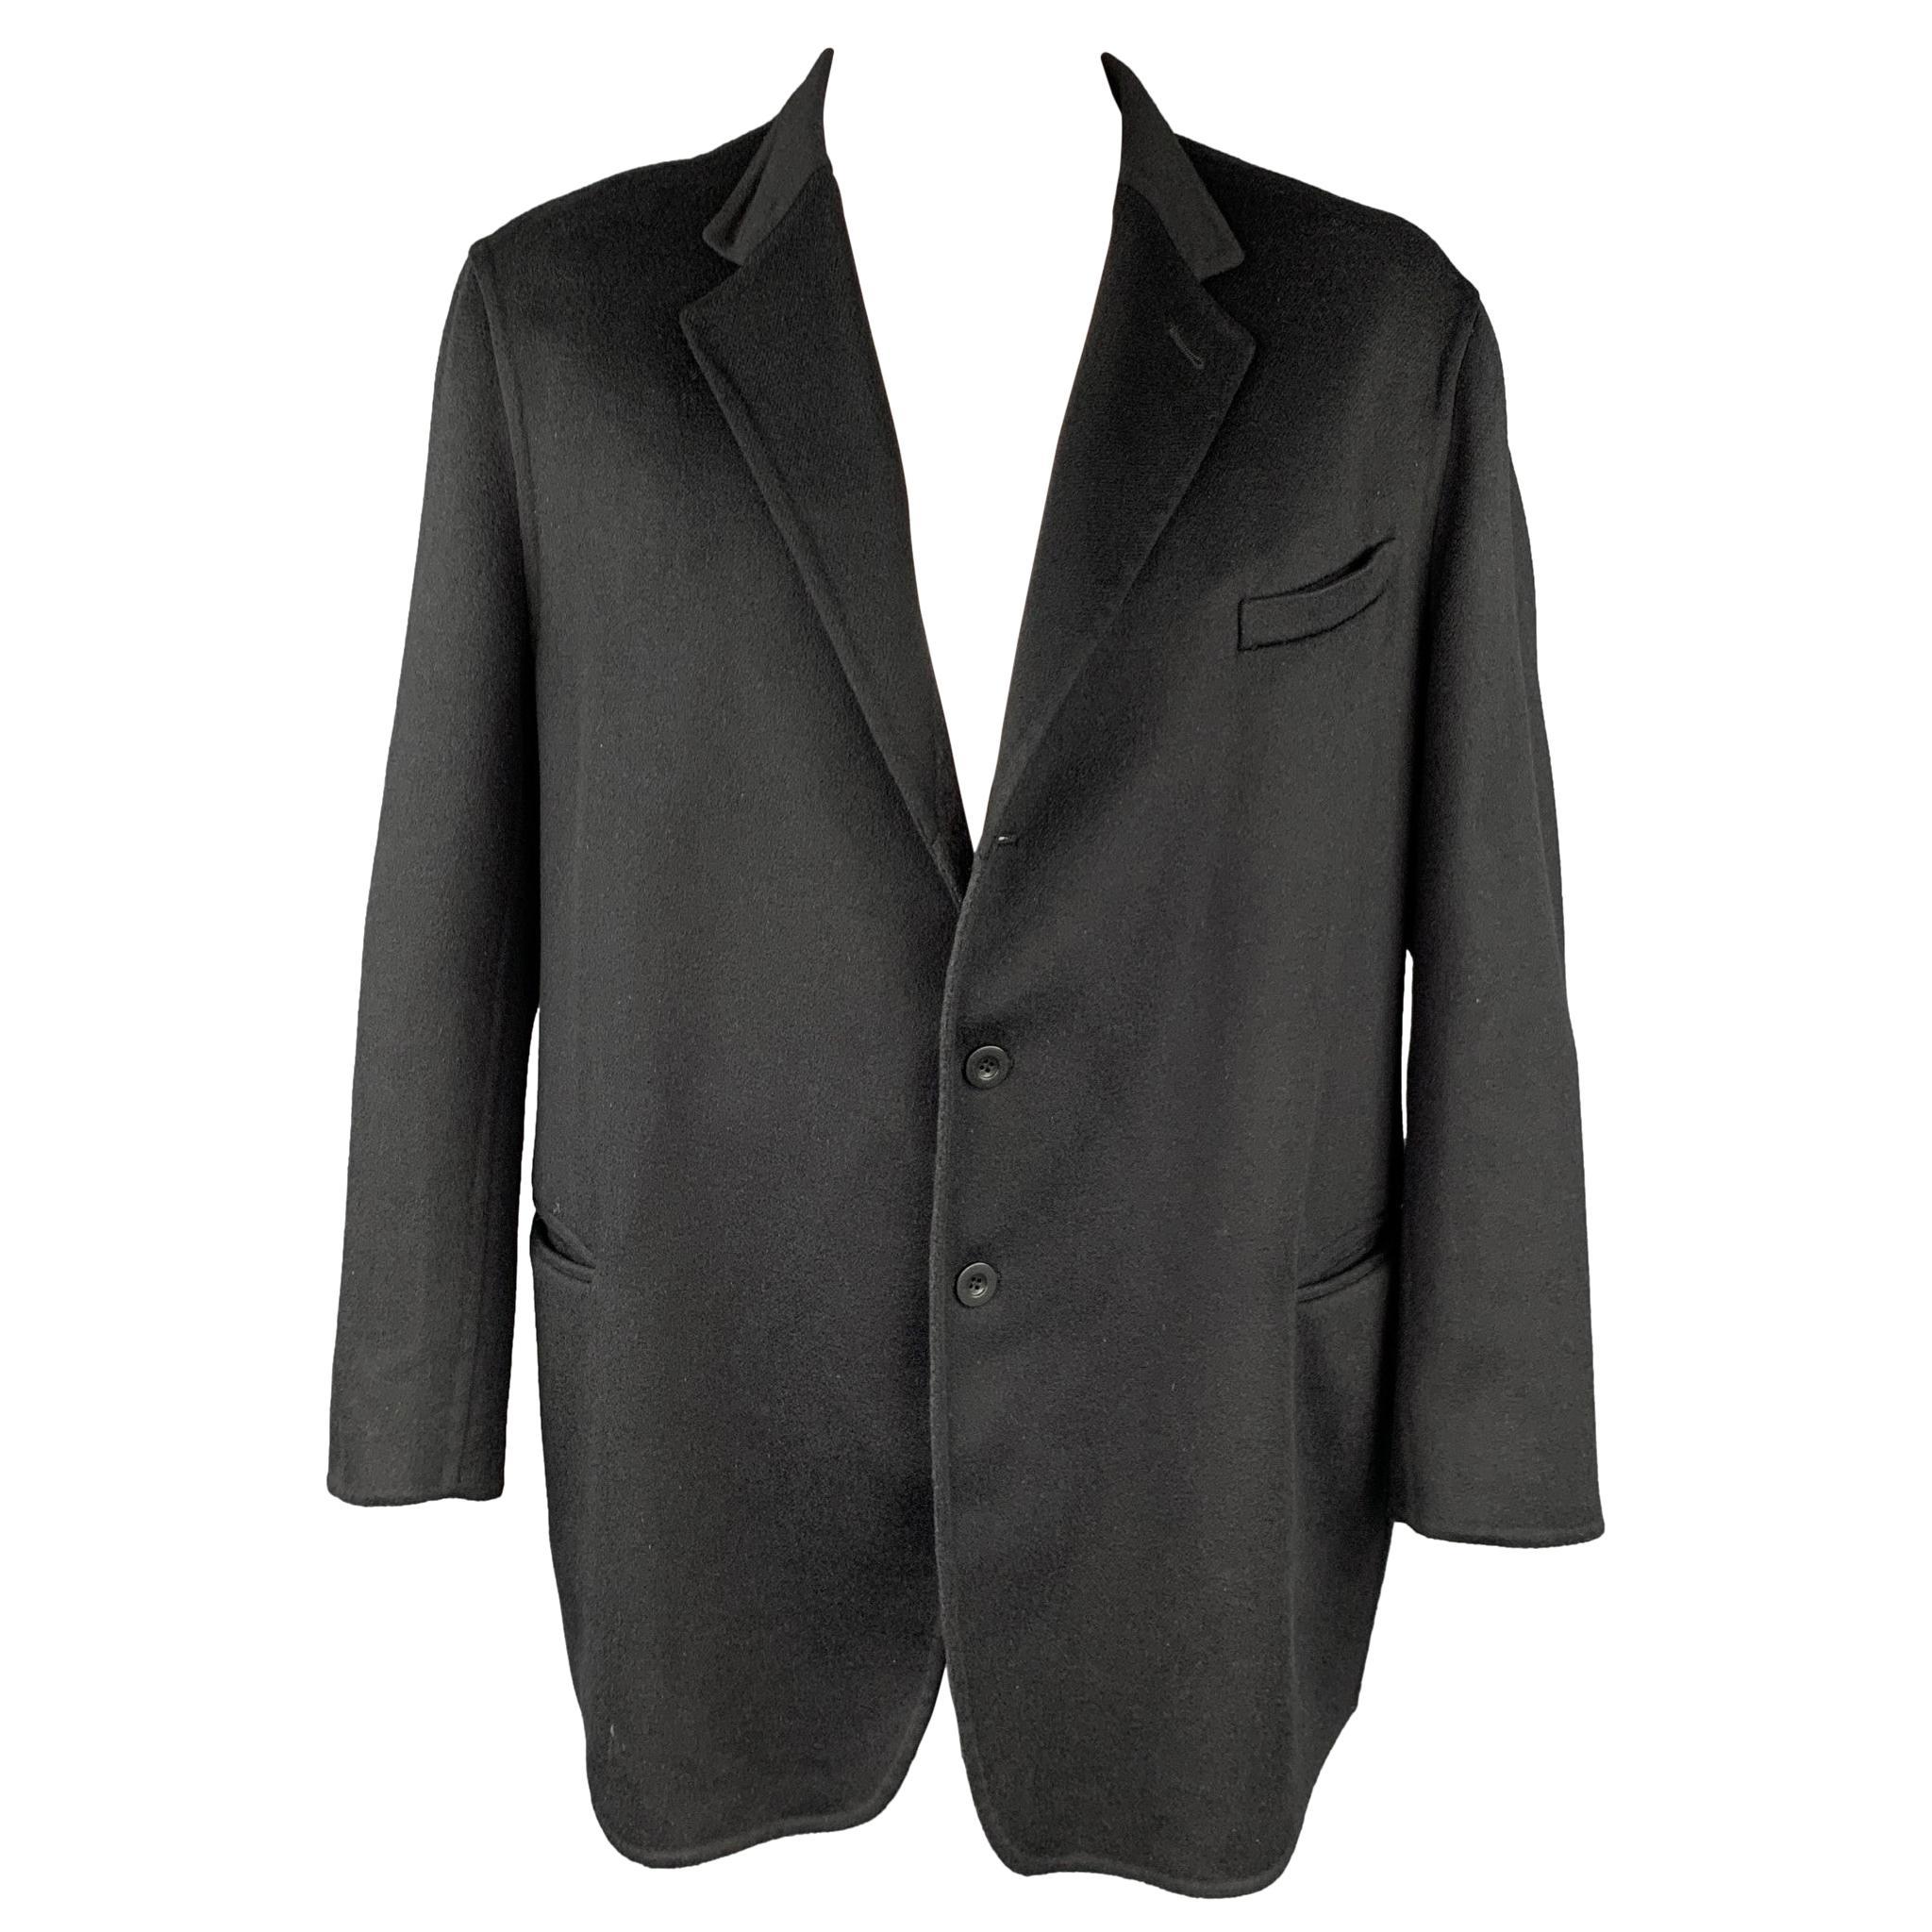 ARMANI COLLEZIONI Size 50 Black Cashmere Notch Lapel Sport Coat